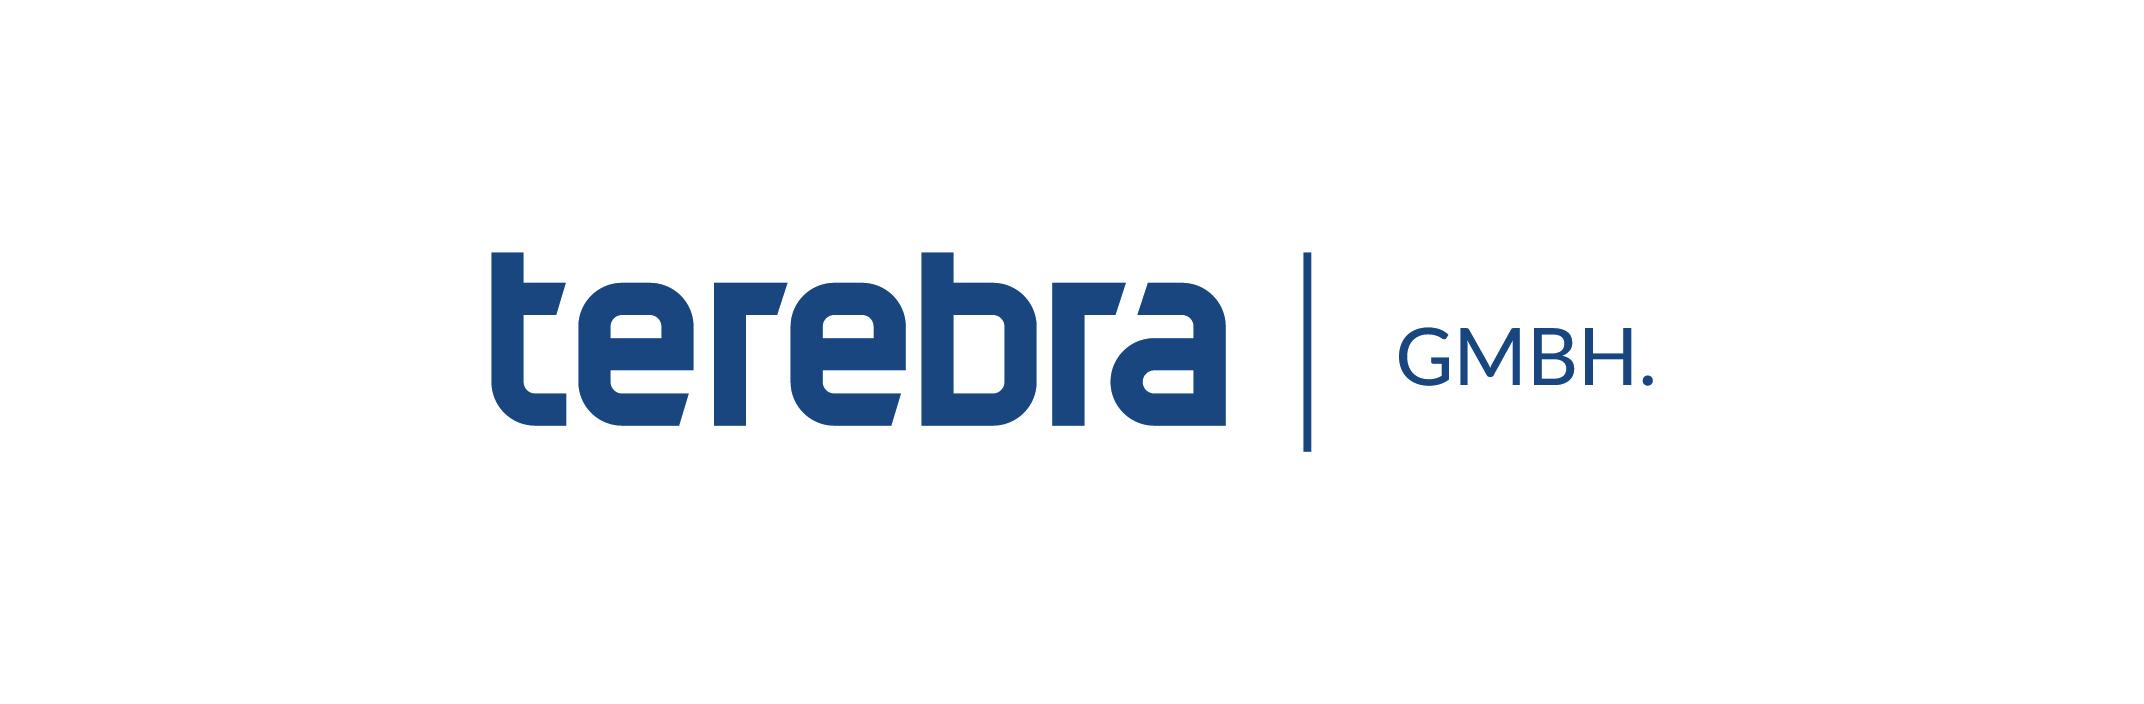 logo_terebra_gmbt_11